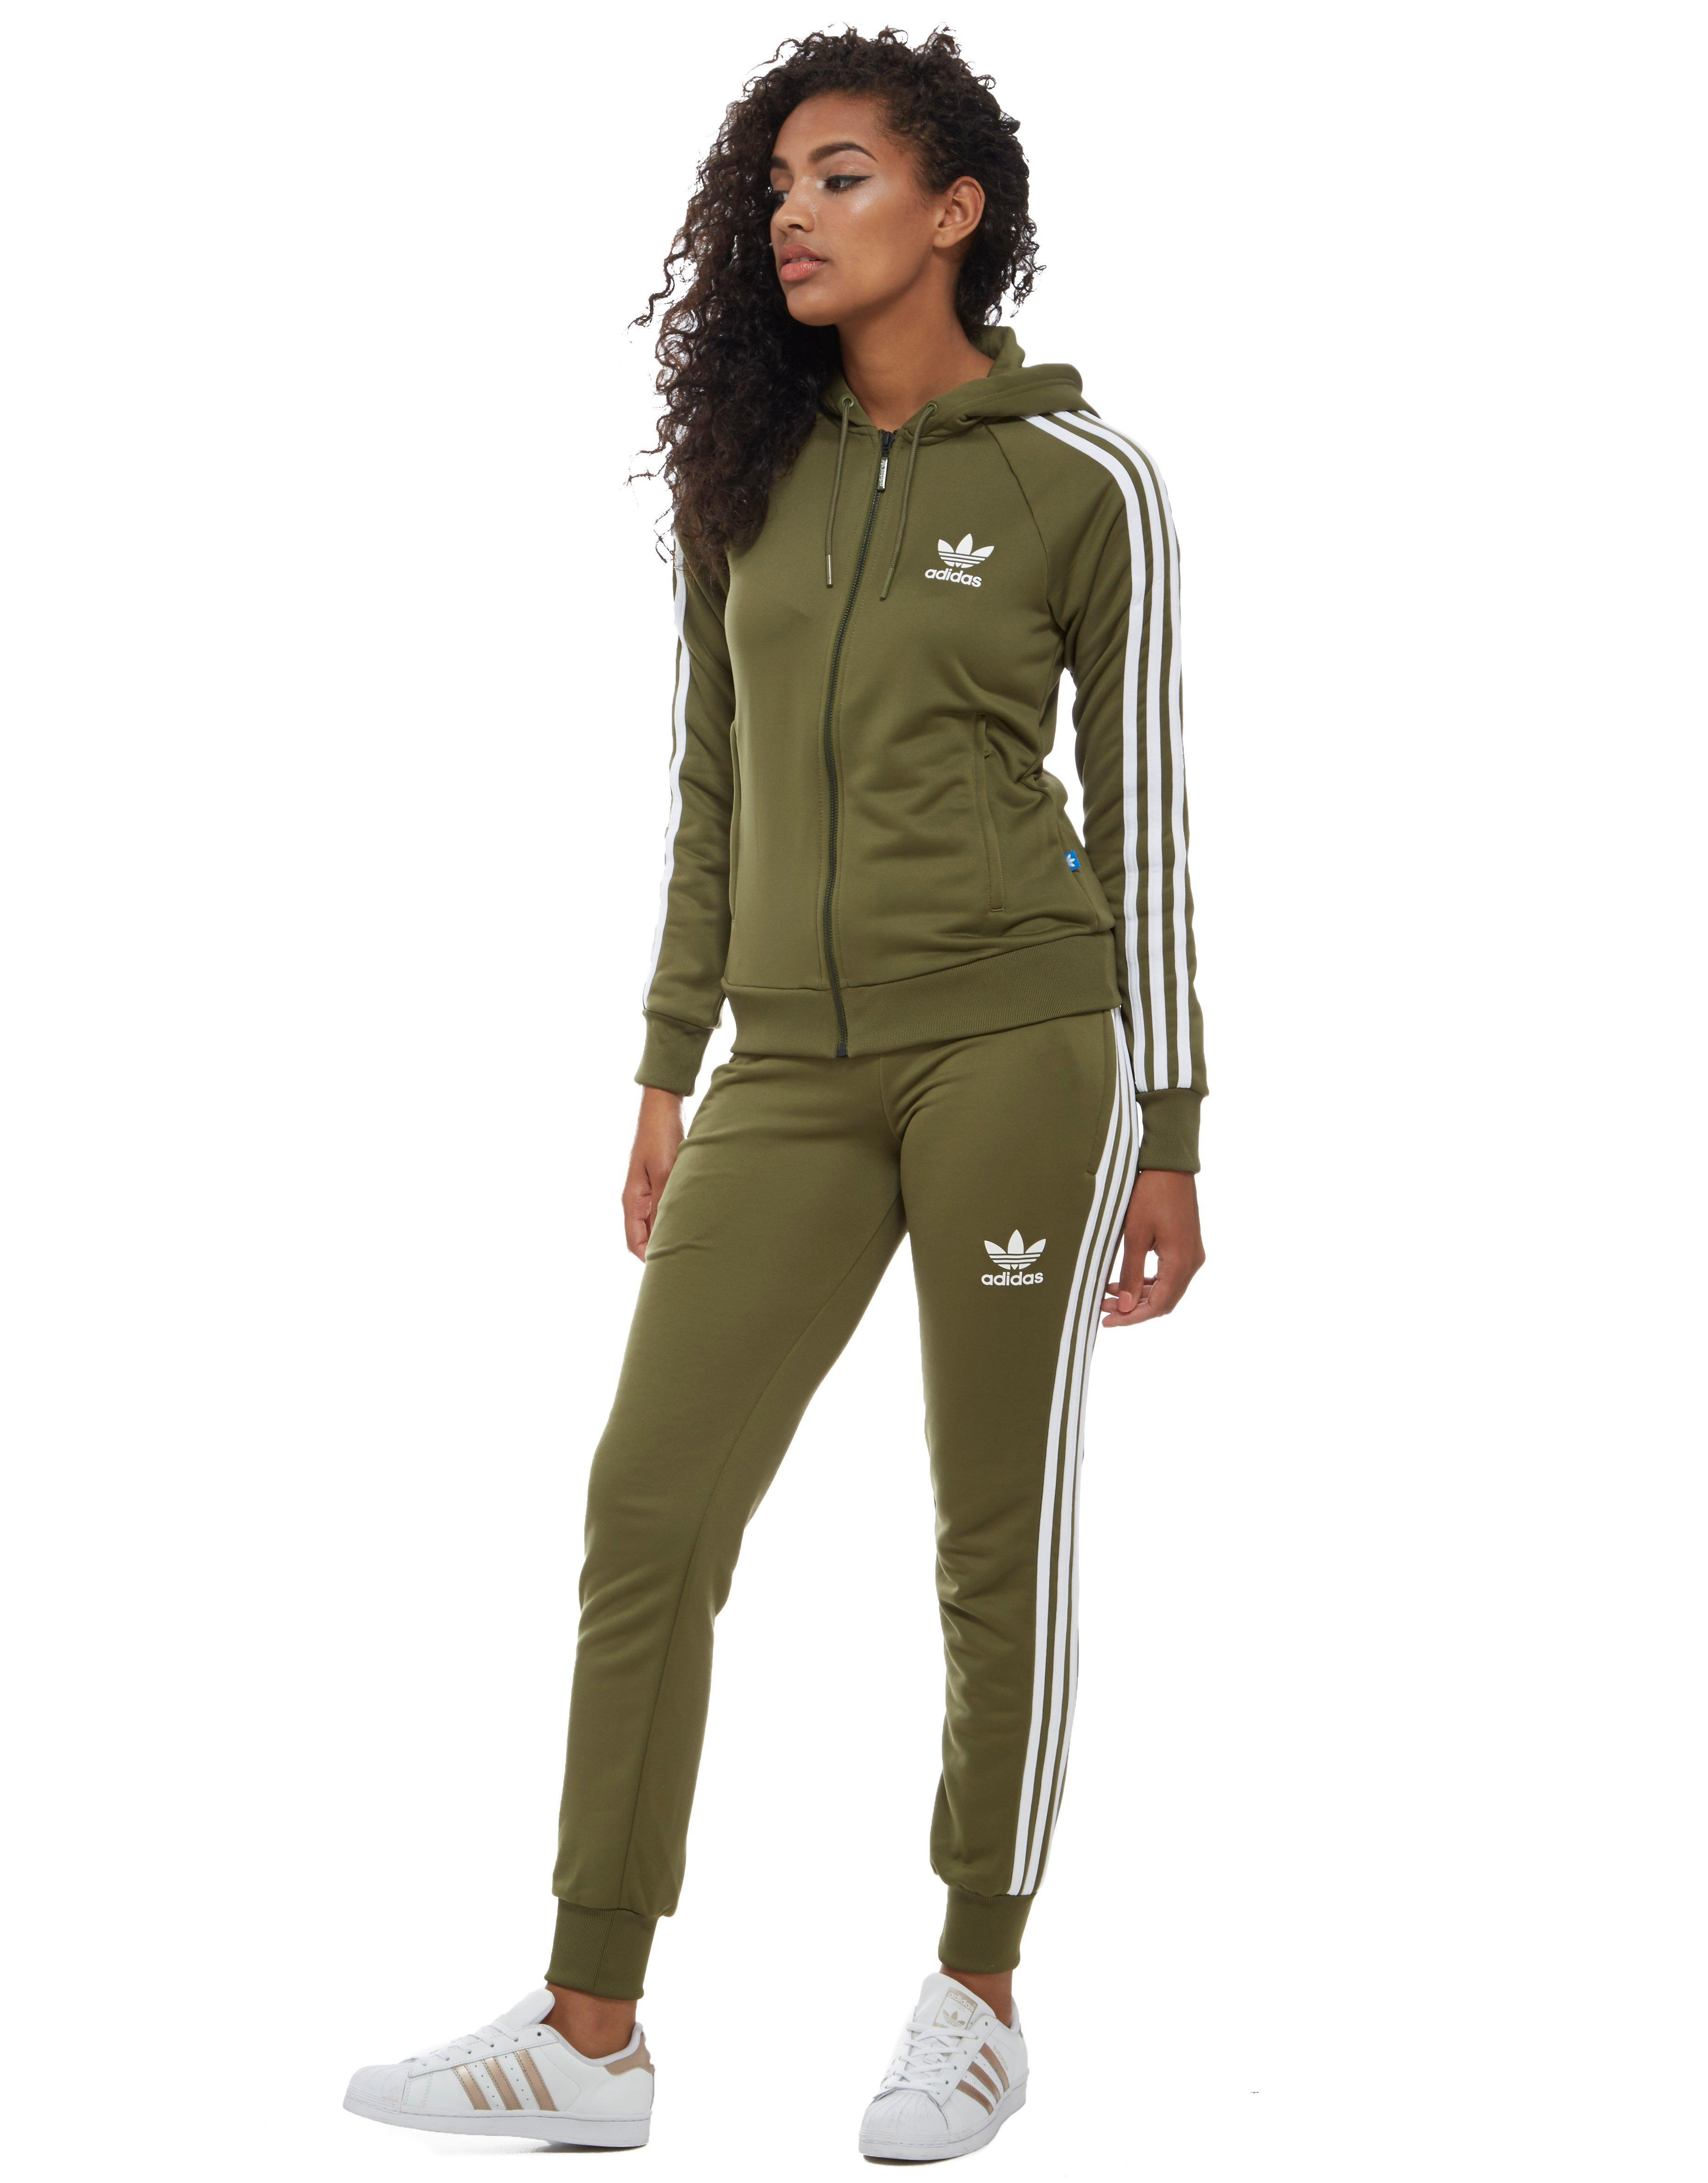 Adidas Fashion Hoodie On Women